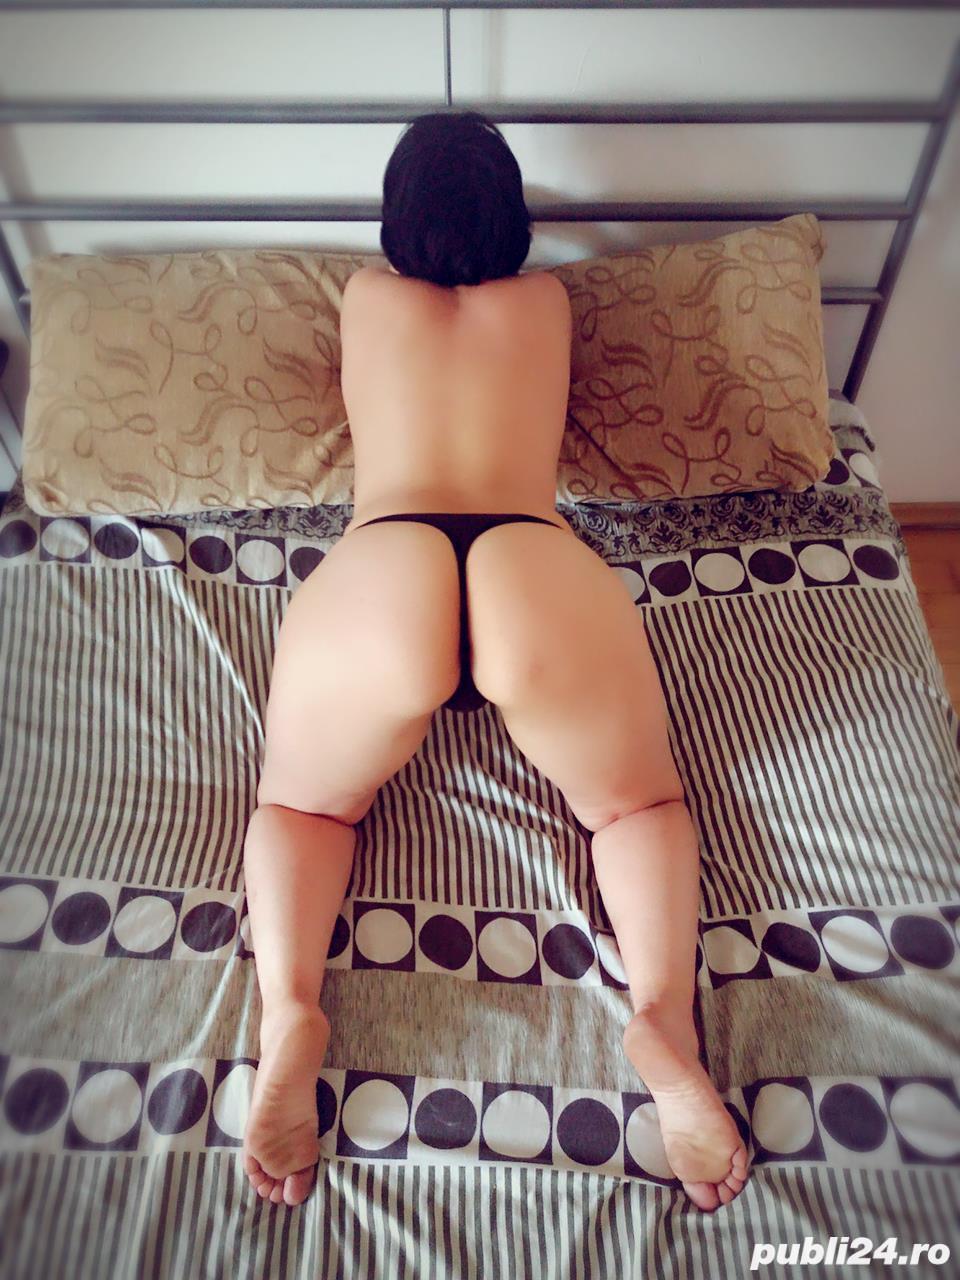 Sunt o doamna pentru domnii care stiu ce vor in pat